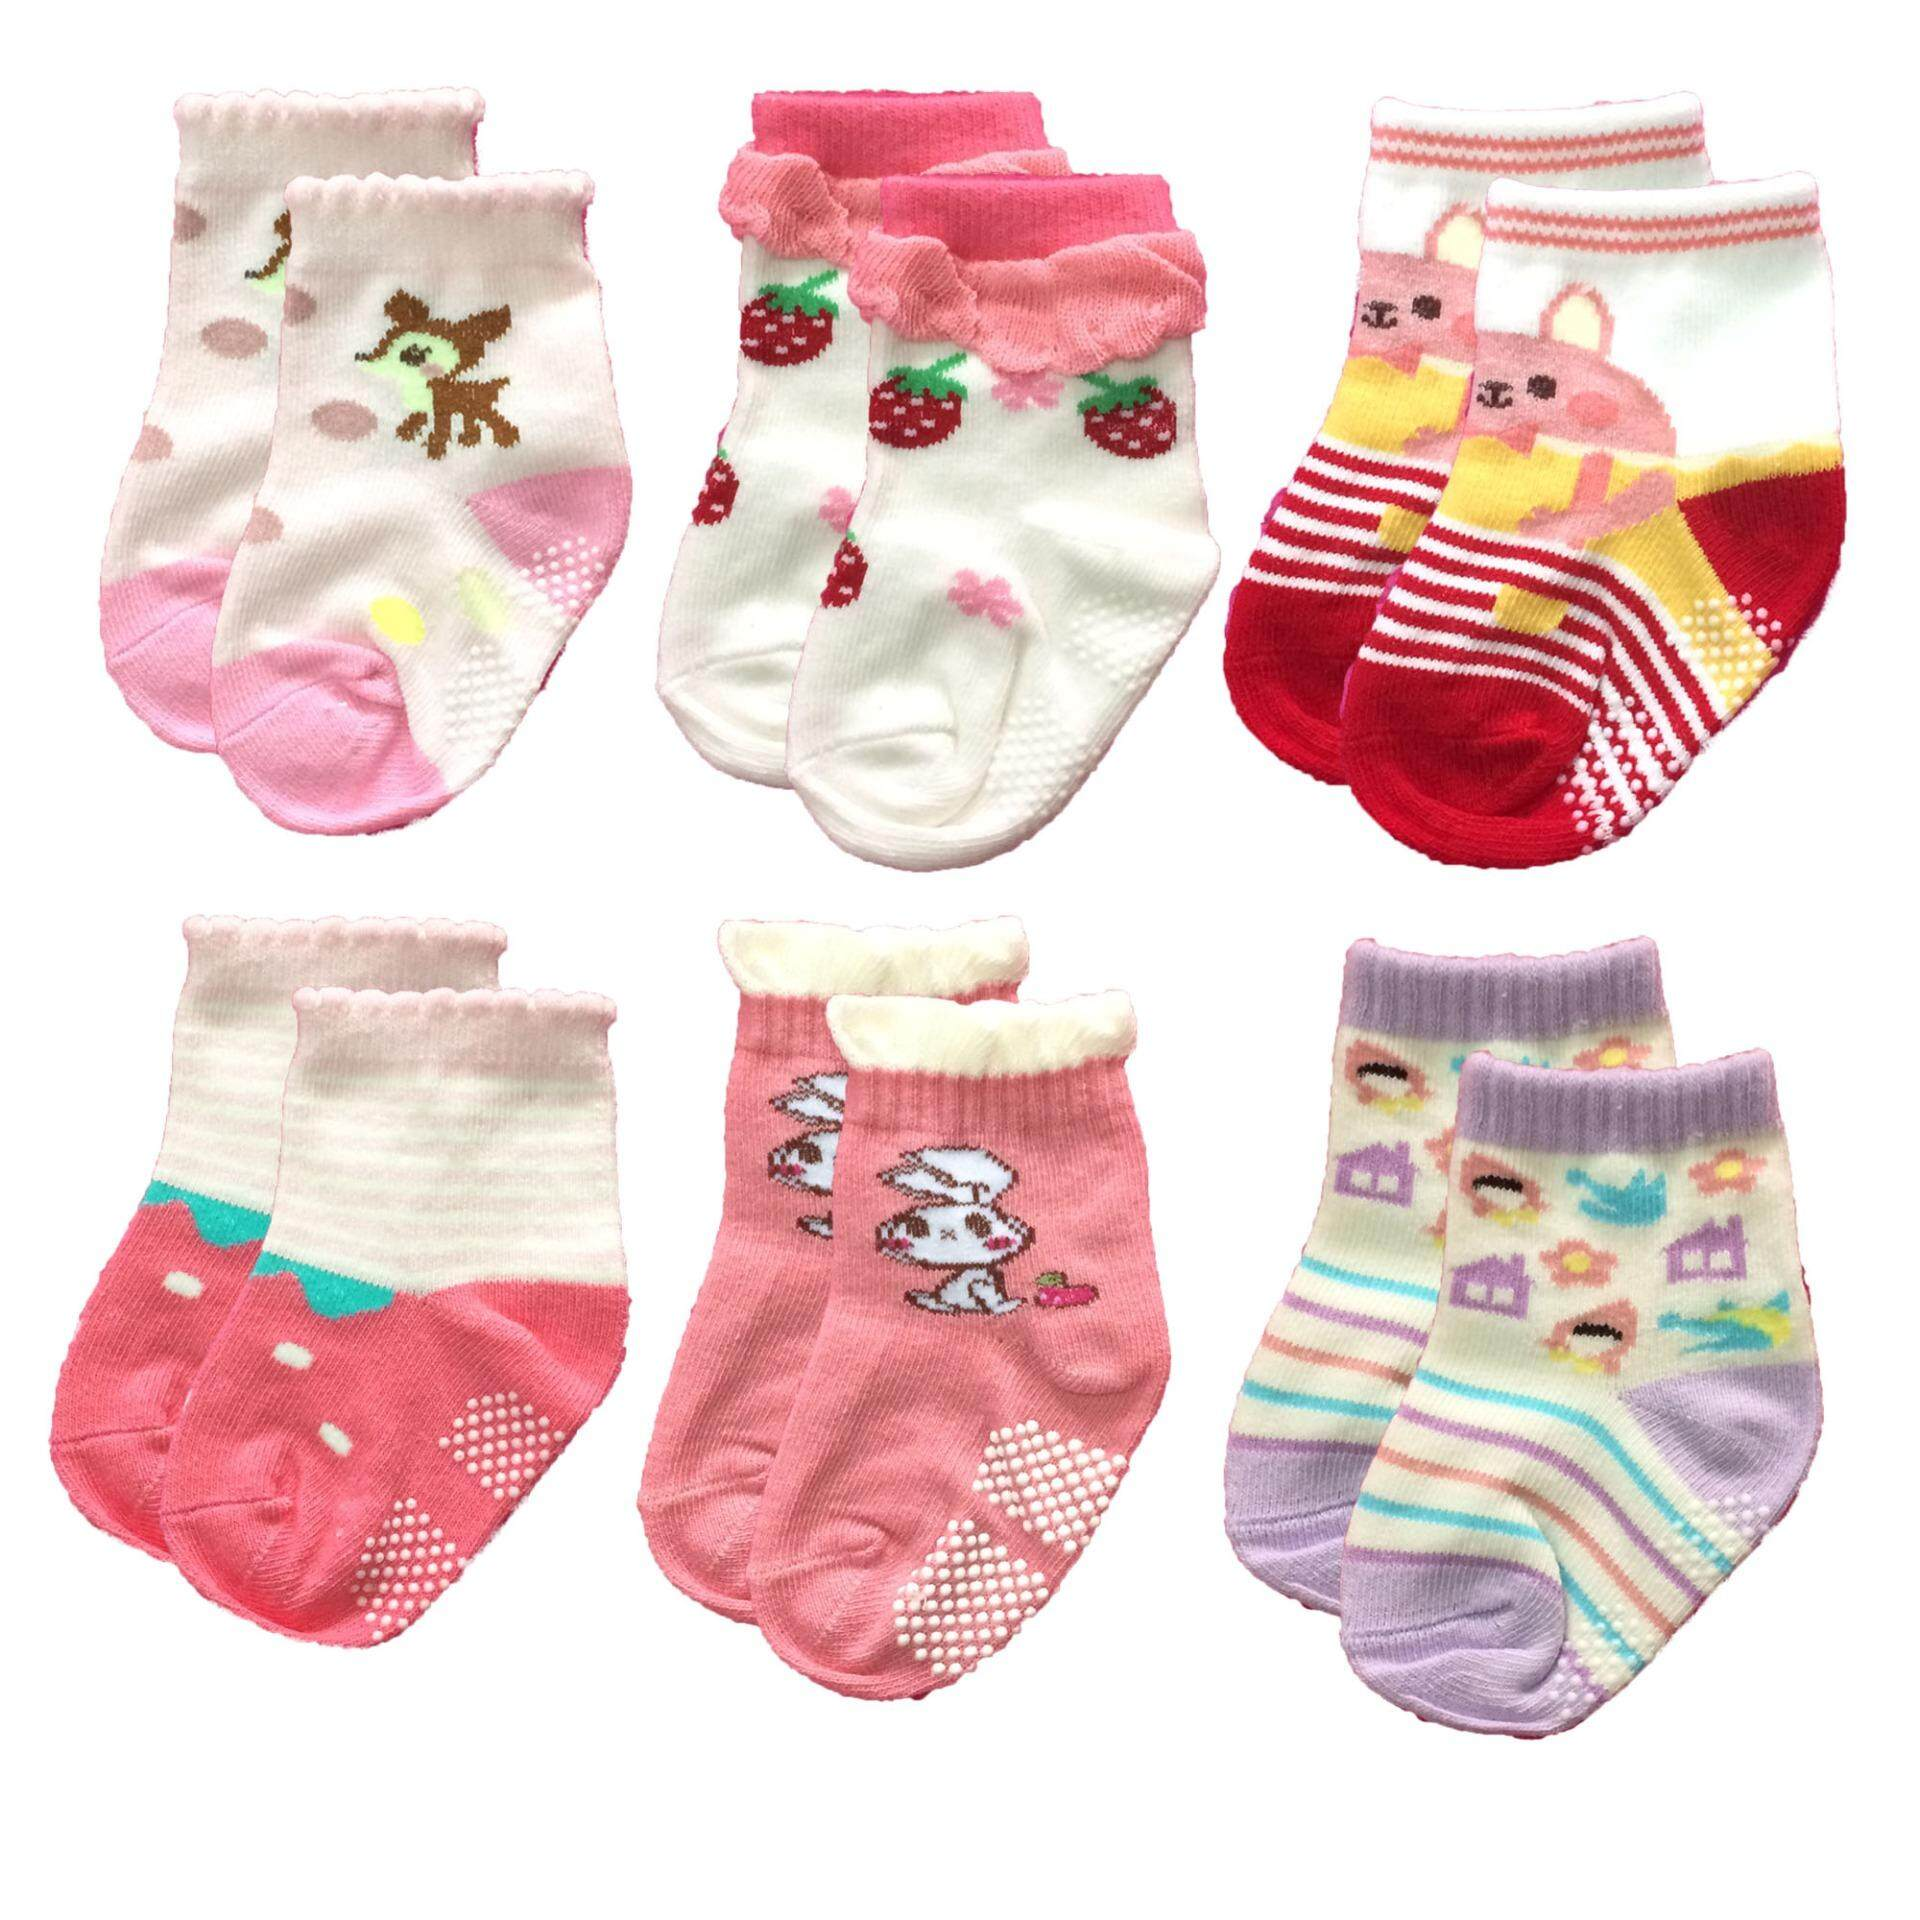 Kamphu ถุงเท้าเด็ก ถุงเท้ากันลื่นเด็ก คละลาย คละสี สำหรับเด็กผู้หญิง อายุ 0-12 เดือน 6 ลาย แพ็ค 6 คู่ By Kamphu.